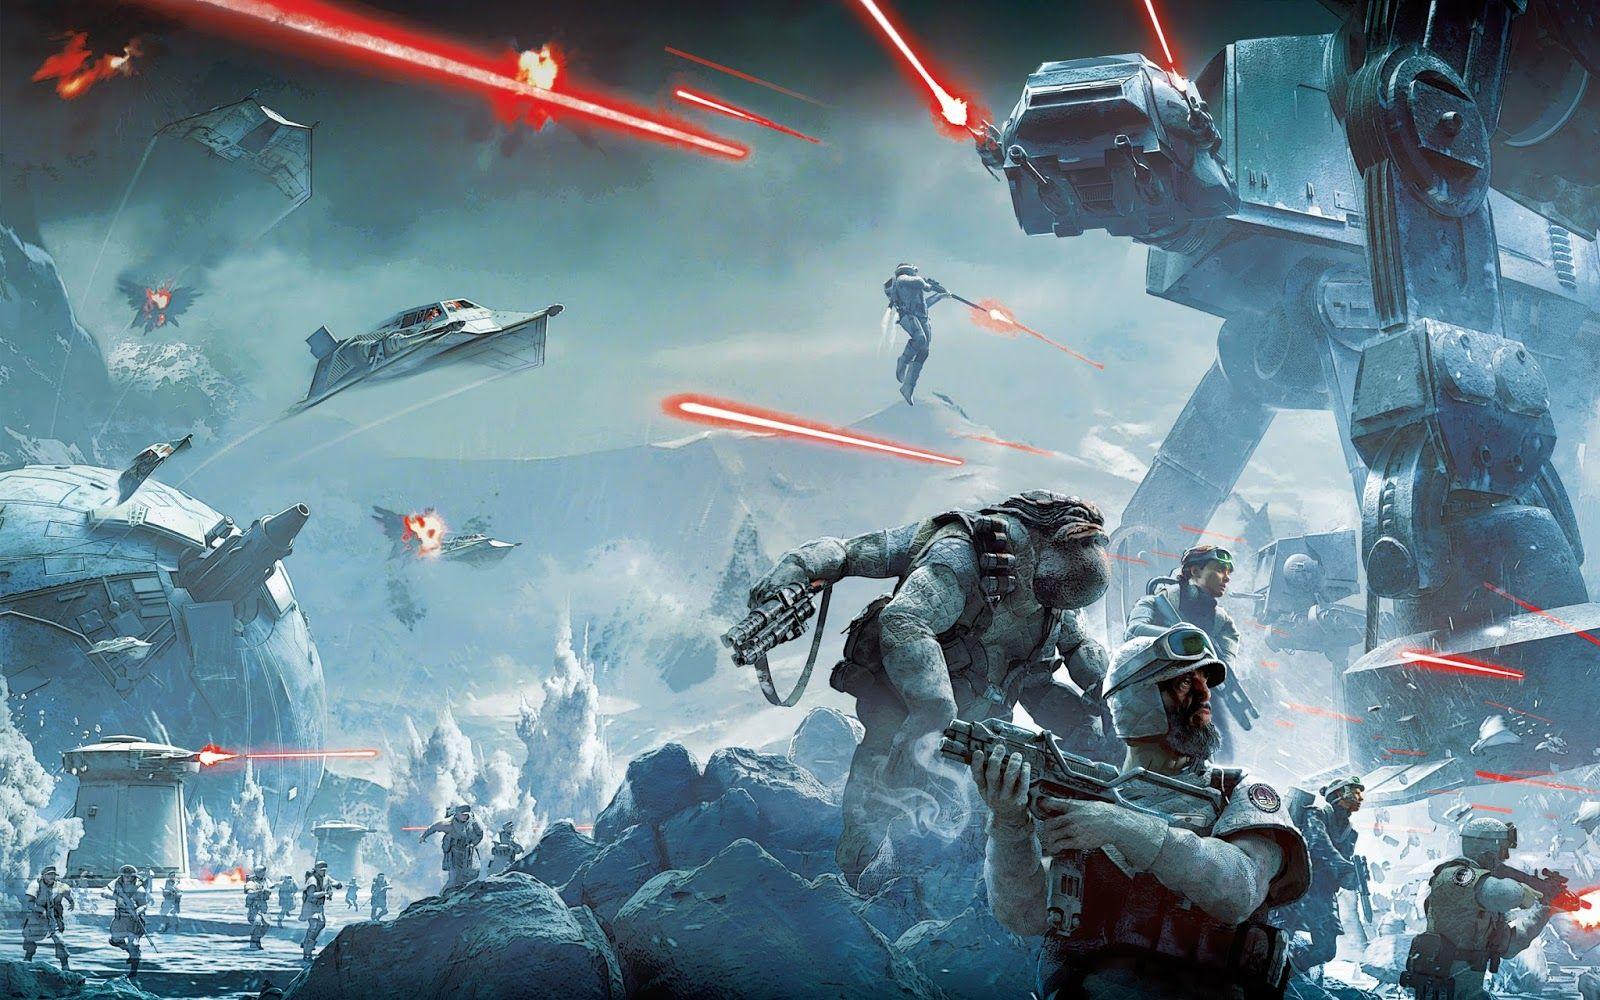 Star Wars Battlefront 3 Star Wars Wallpaper Star Wars Artwork Star Wars Galaxies